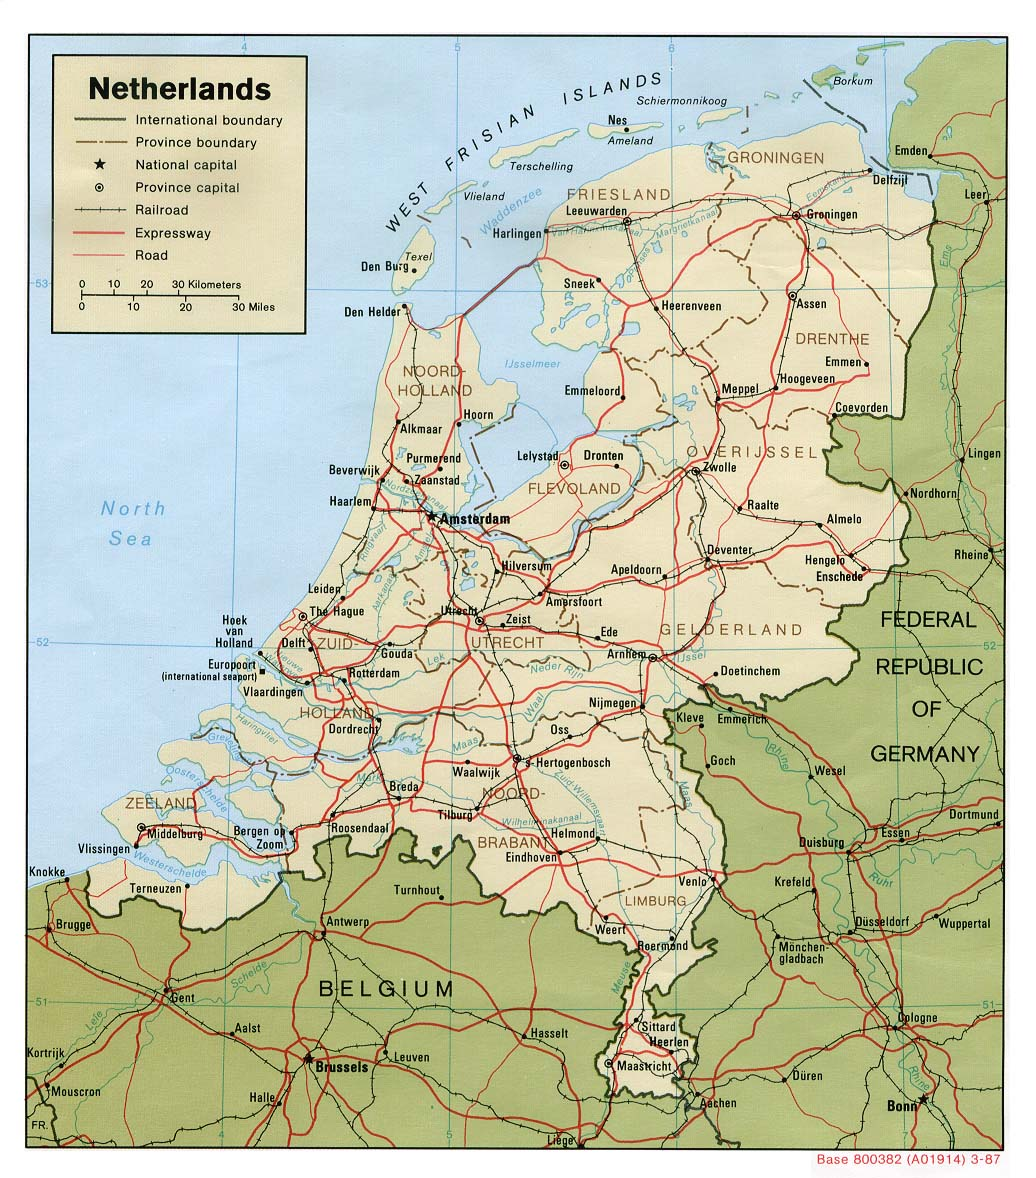 FileNetherlands political Map 1987jpg The Work of Gods Children